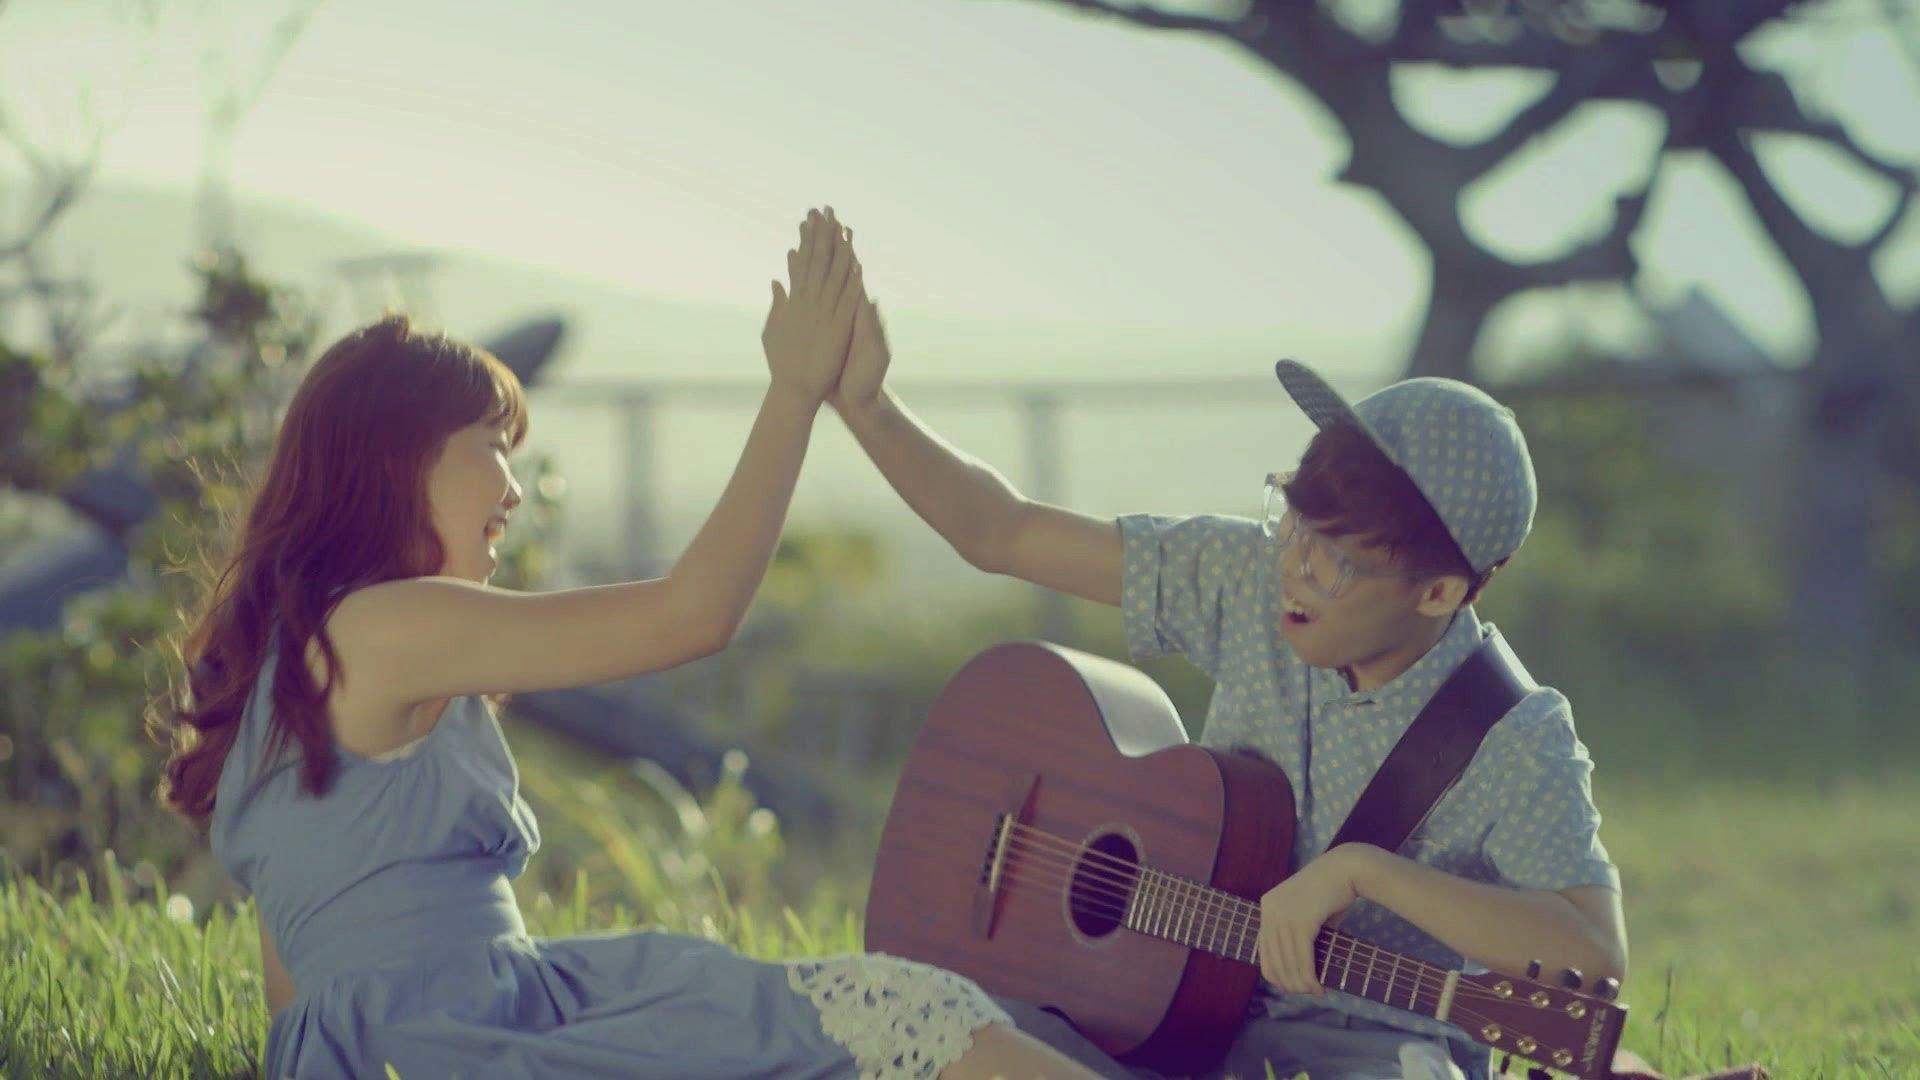 Drawn musician lov Musician(AKMU) YouTube M/V LOVE GIVE